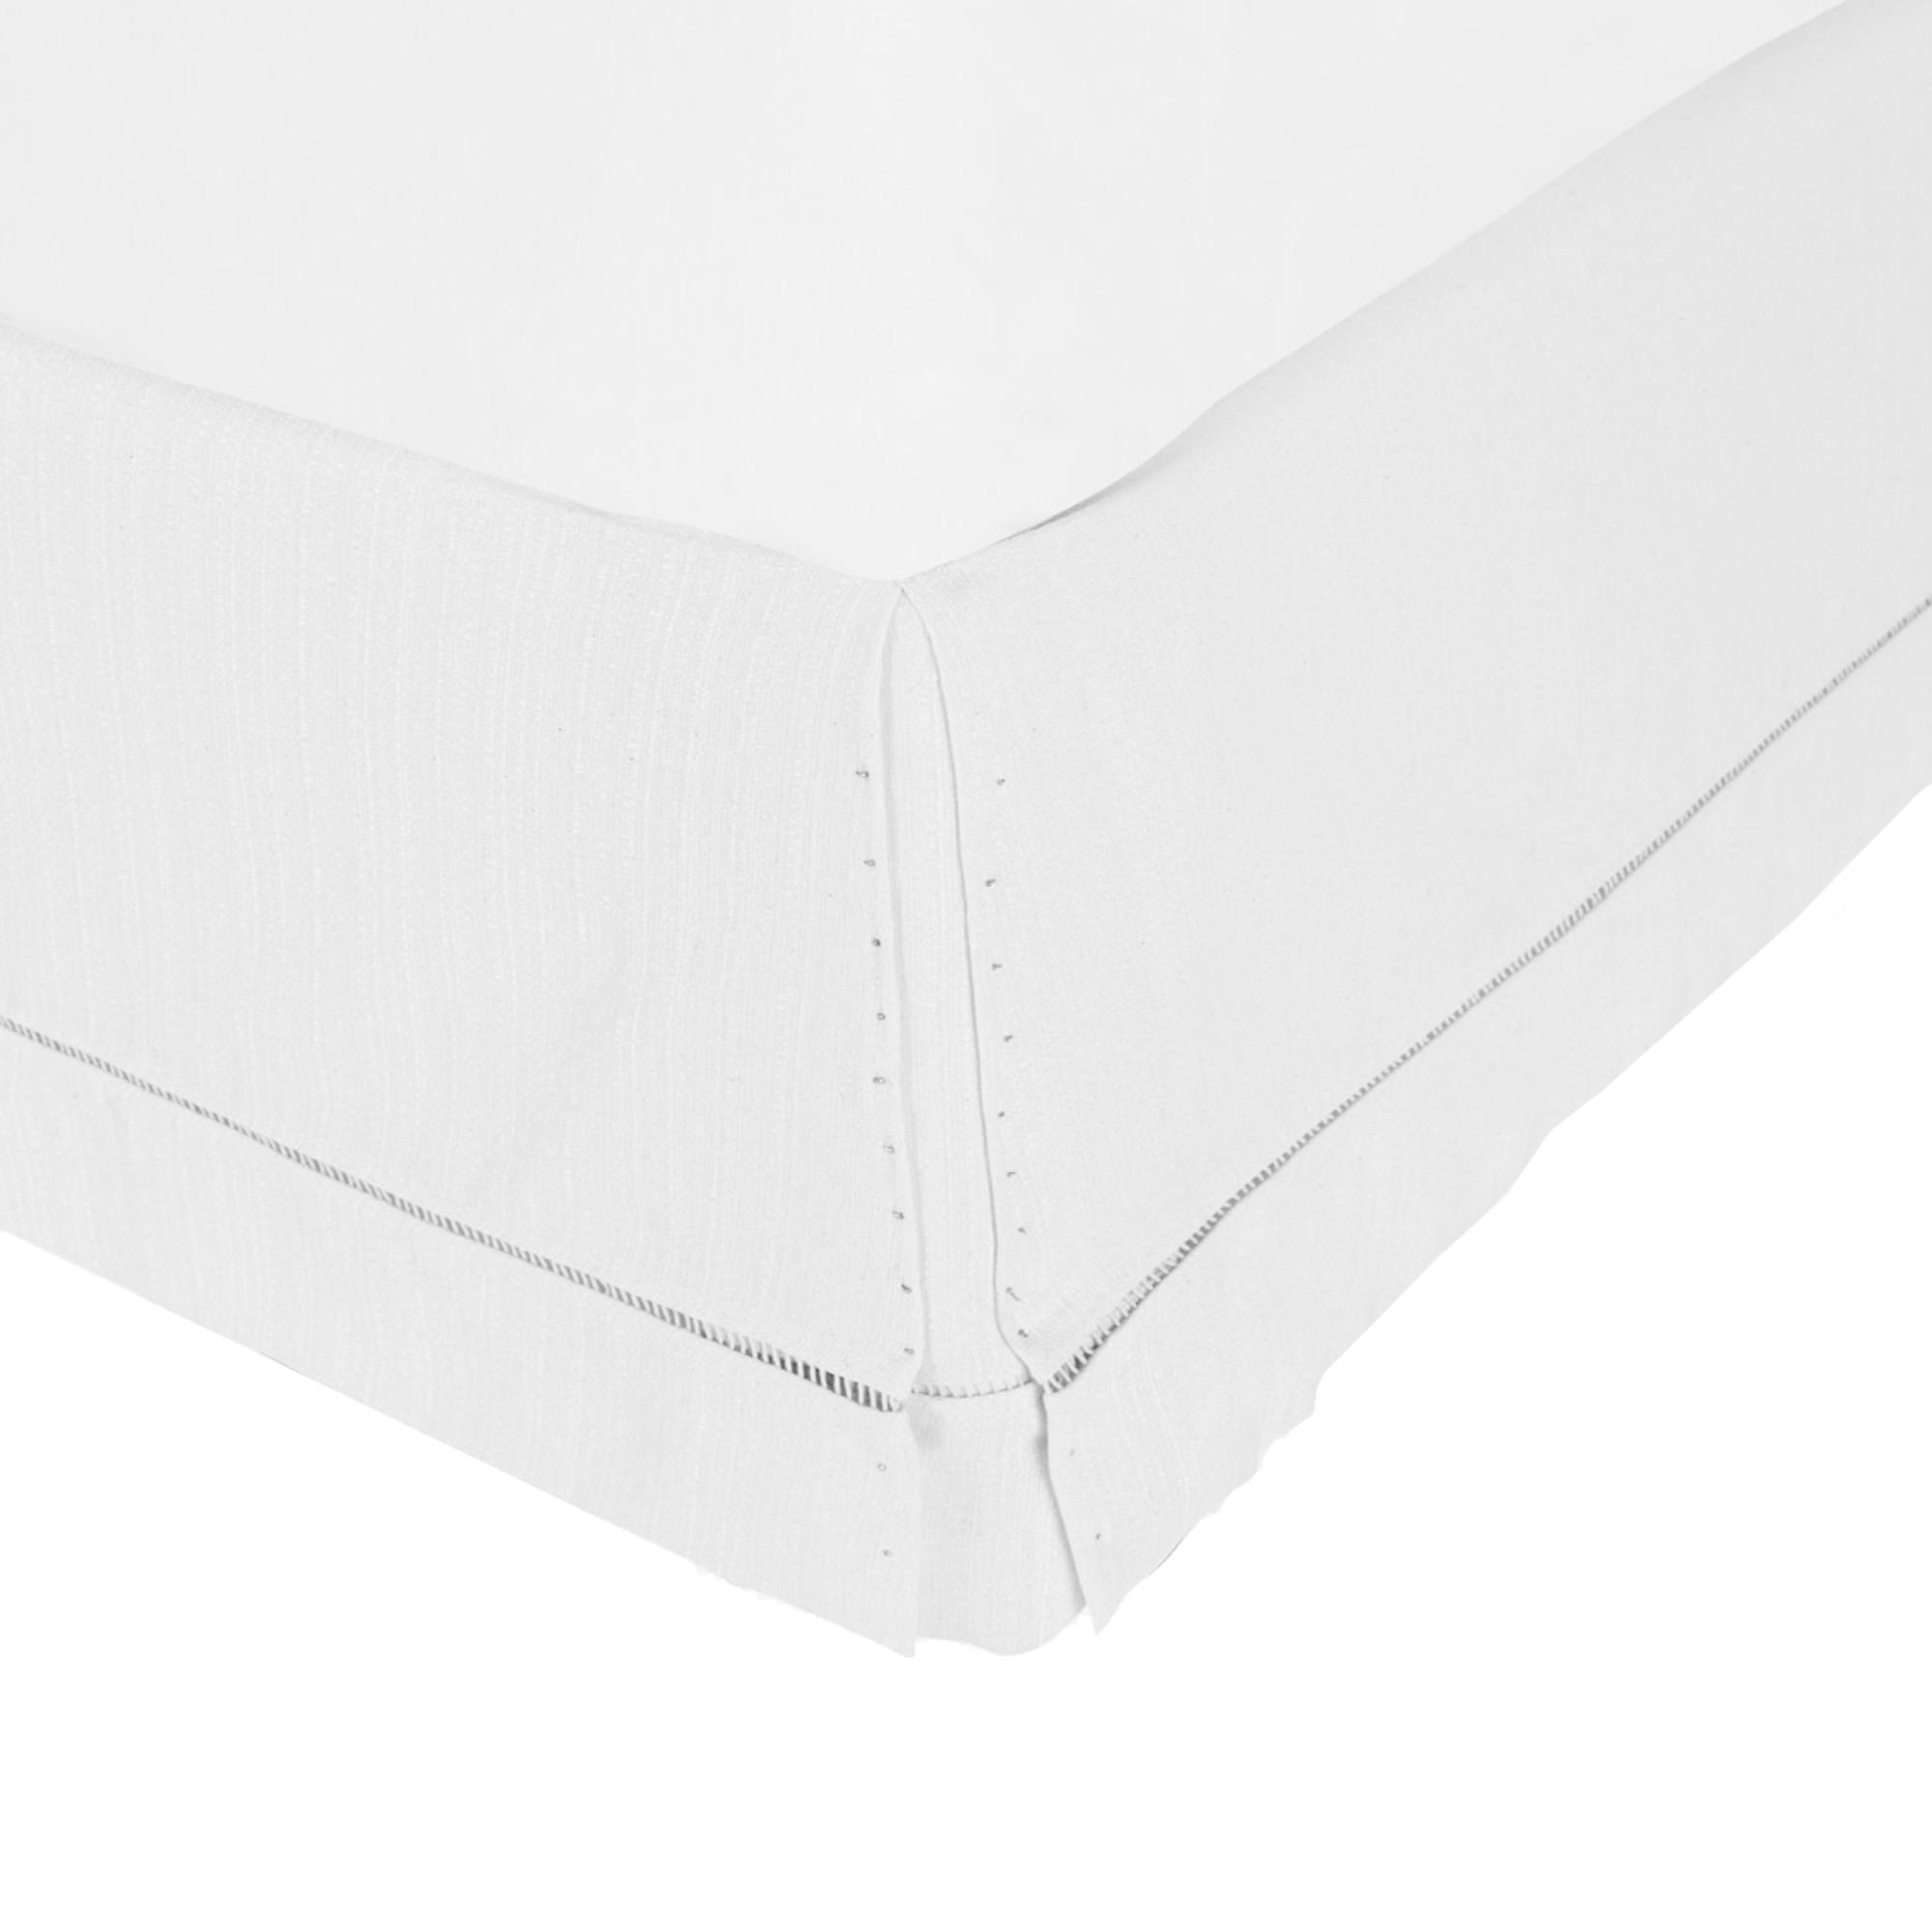 Saia para Cama Box com Ponto Palito Branca [Viúva 108 x 198 cm]